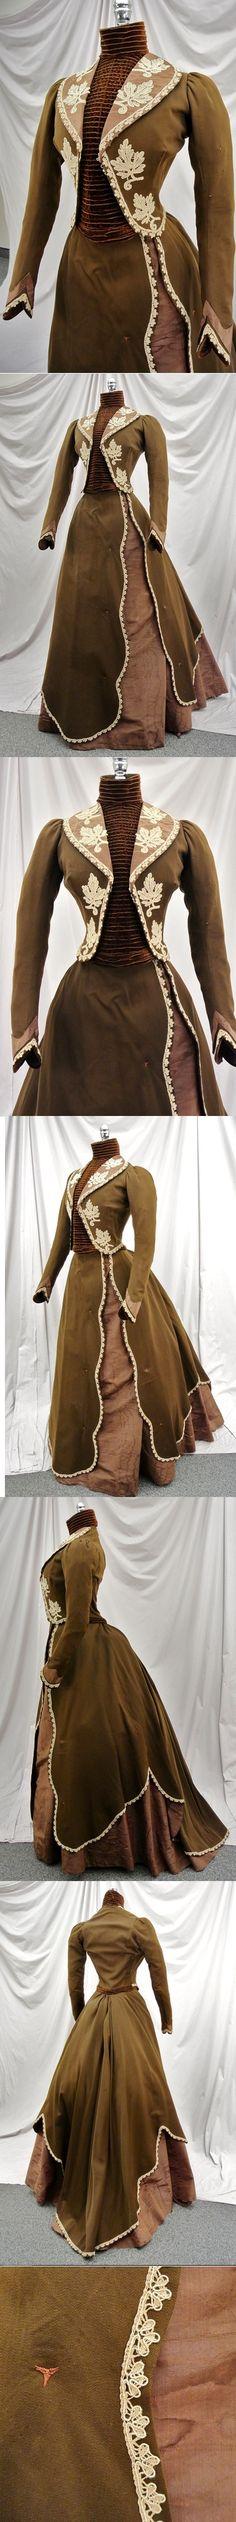 Victorian 1870's 1880's Brown Watered Silk, Wool, & Velvet Bustle Dress w/Lace